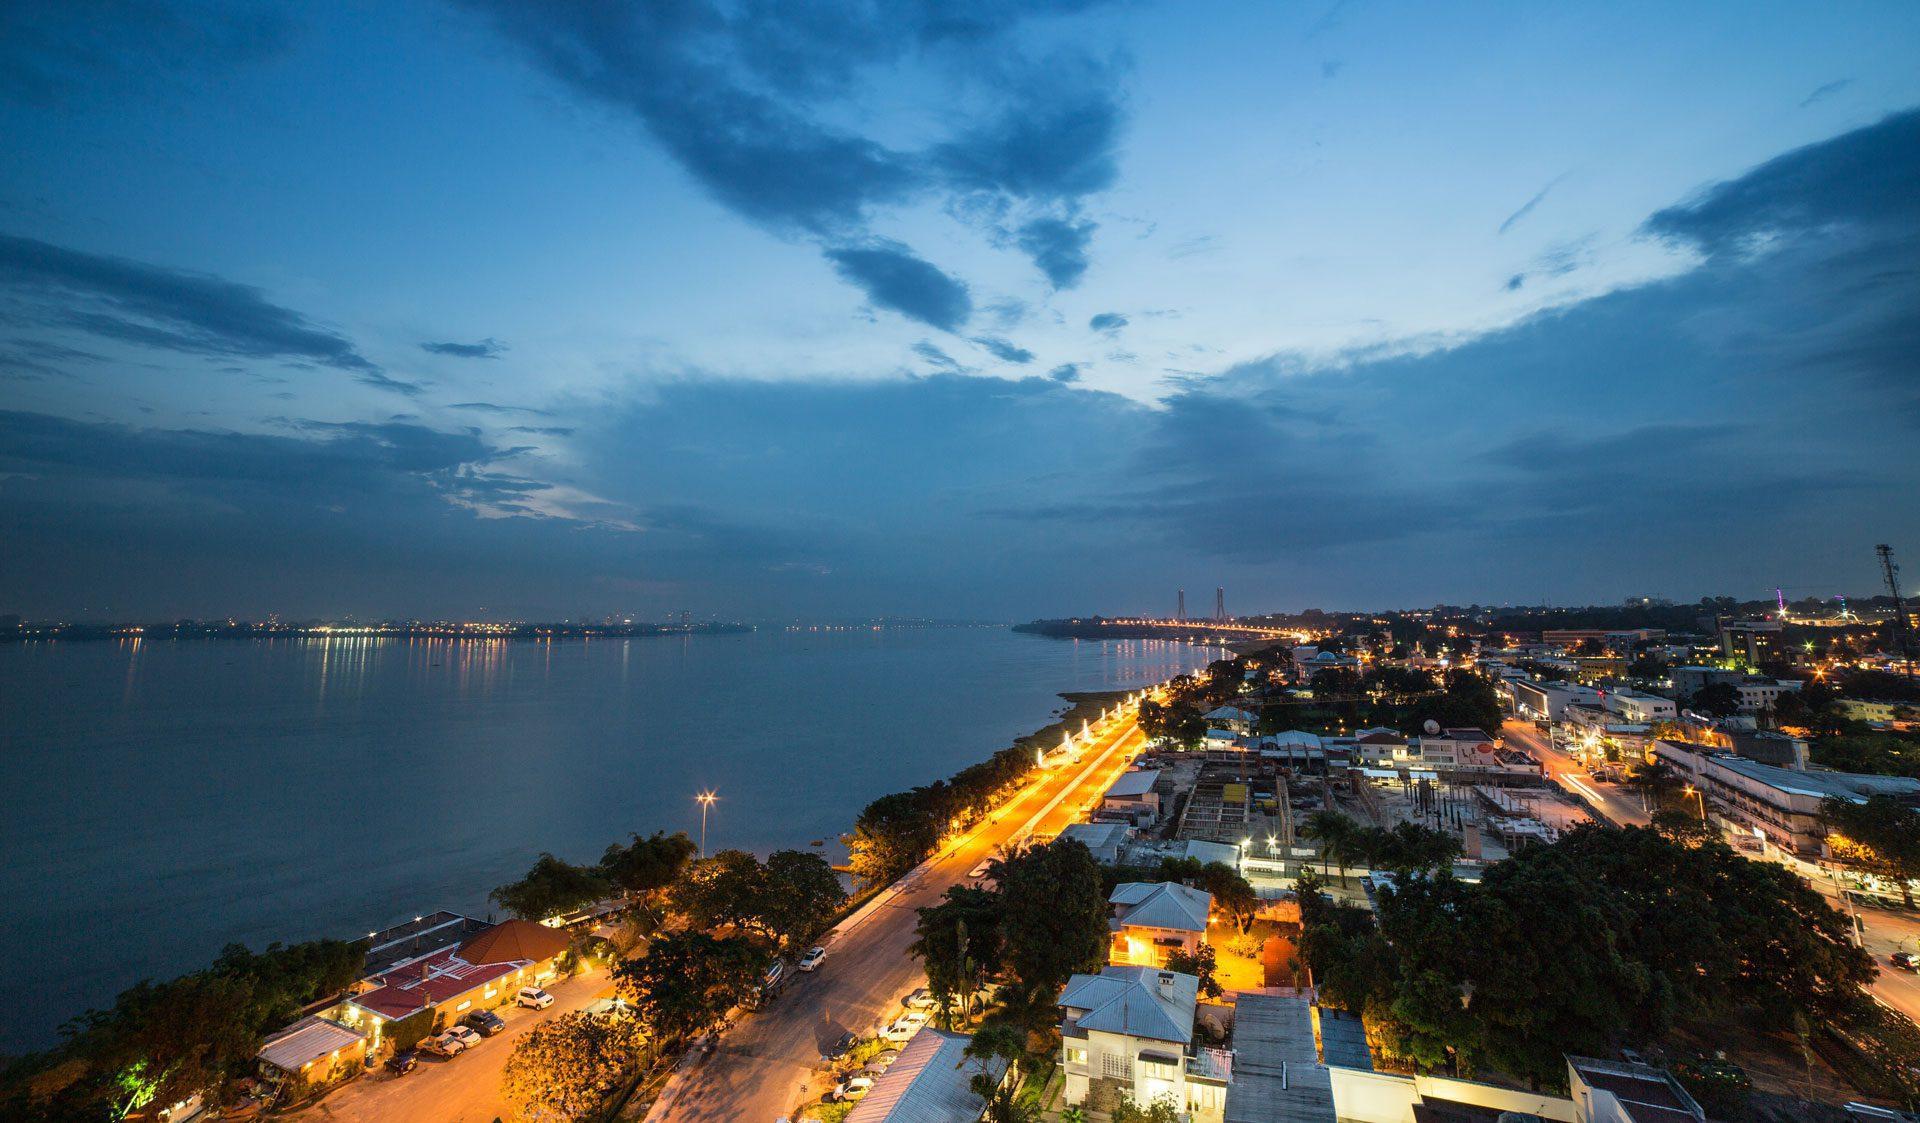 coastline of Brazzaville